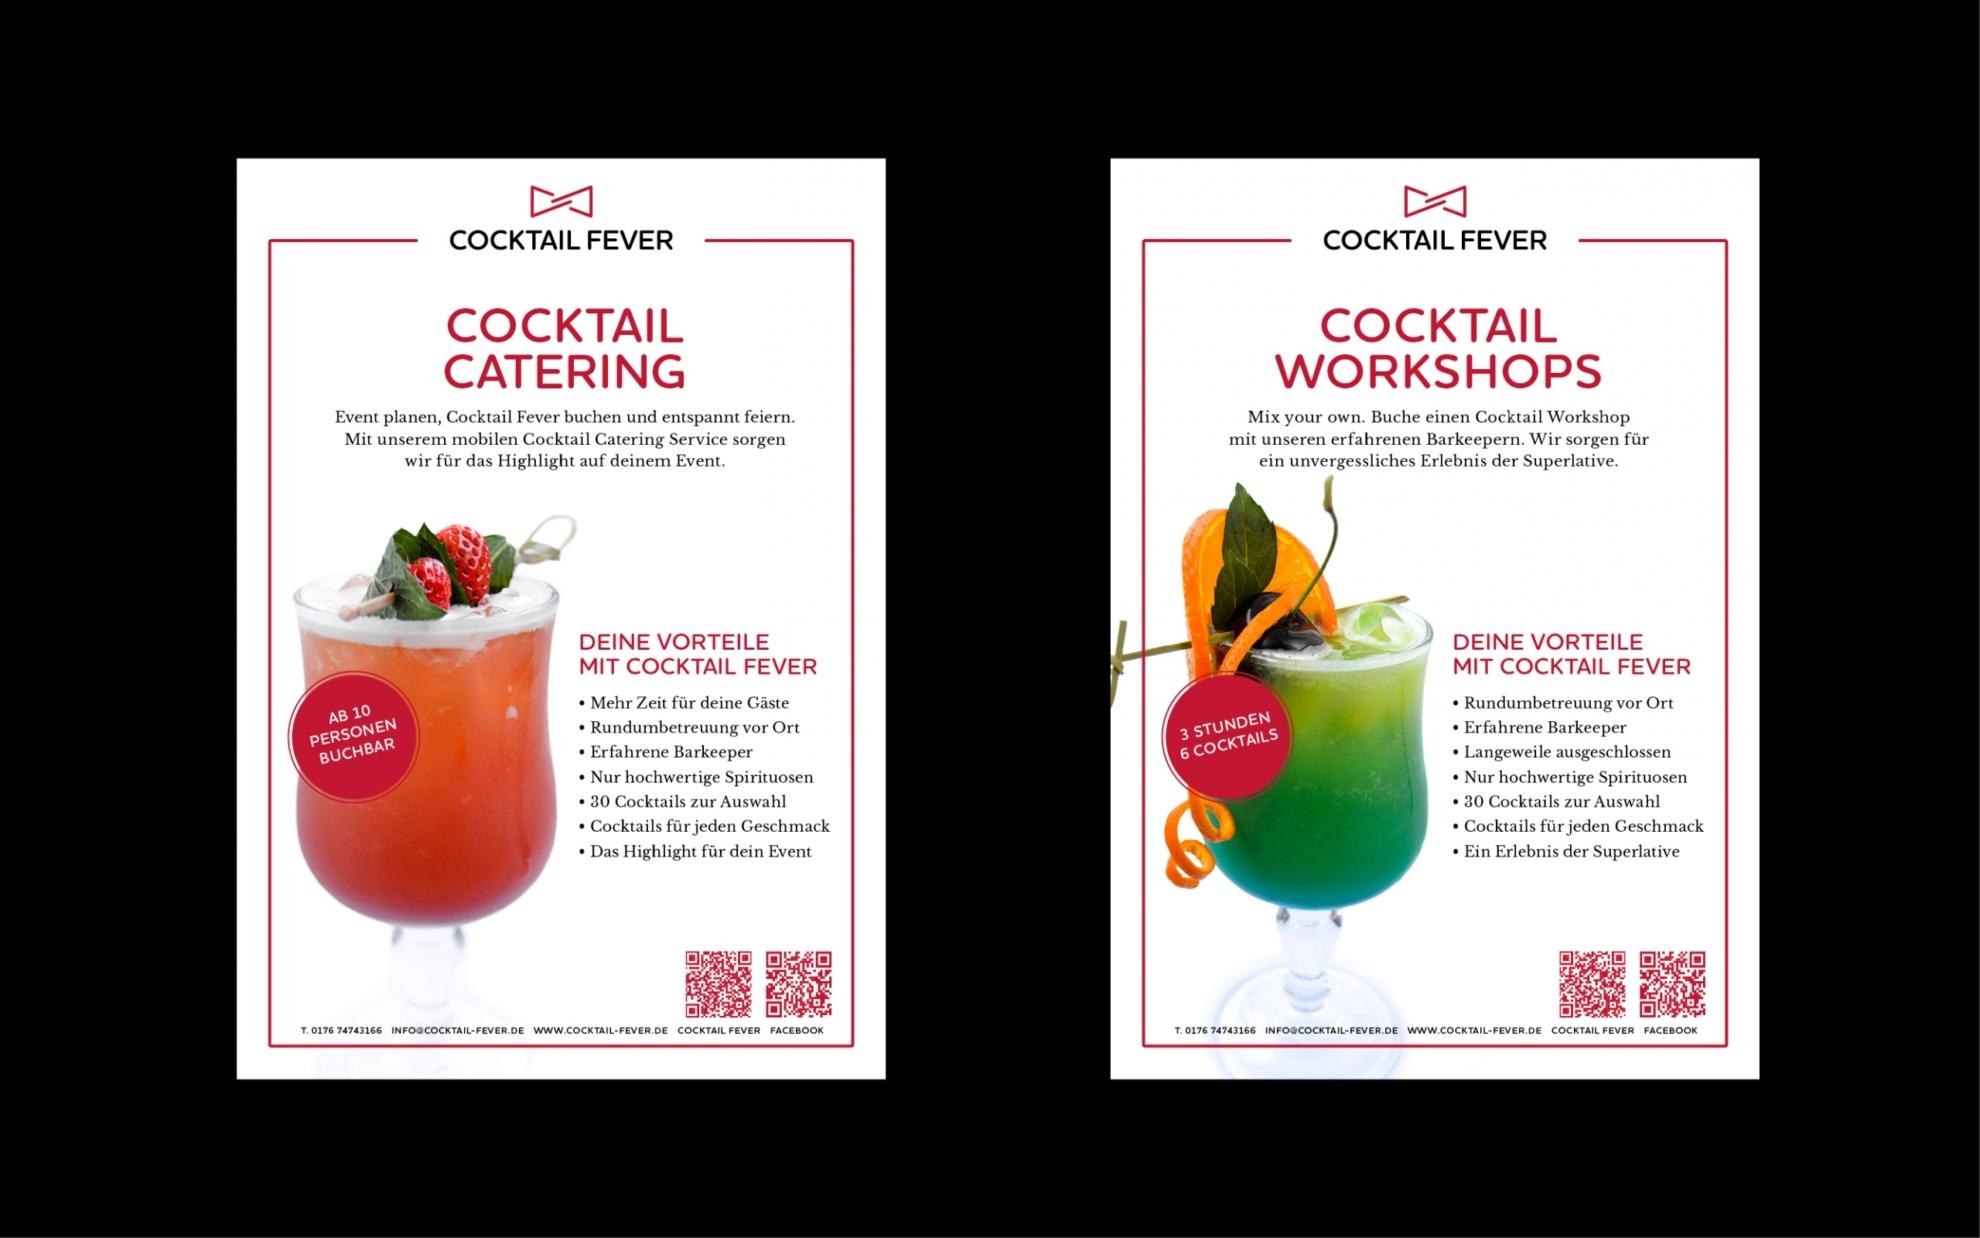 Designbüro Mittelsdorf Cocktail Fever → Corporate Design, Grafikdesign, Webdesign